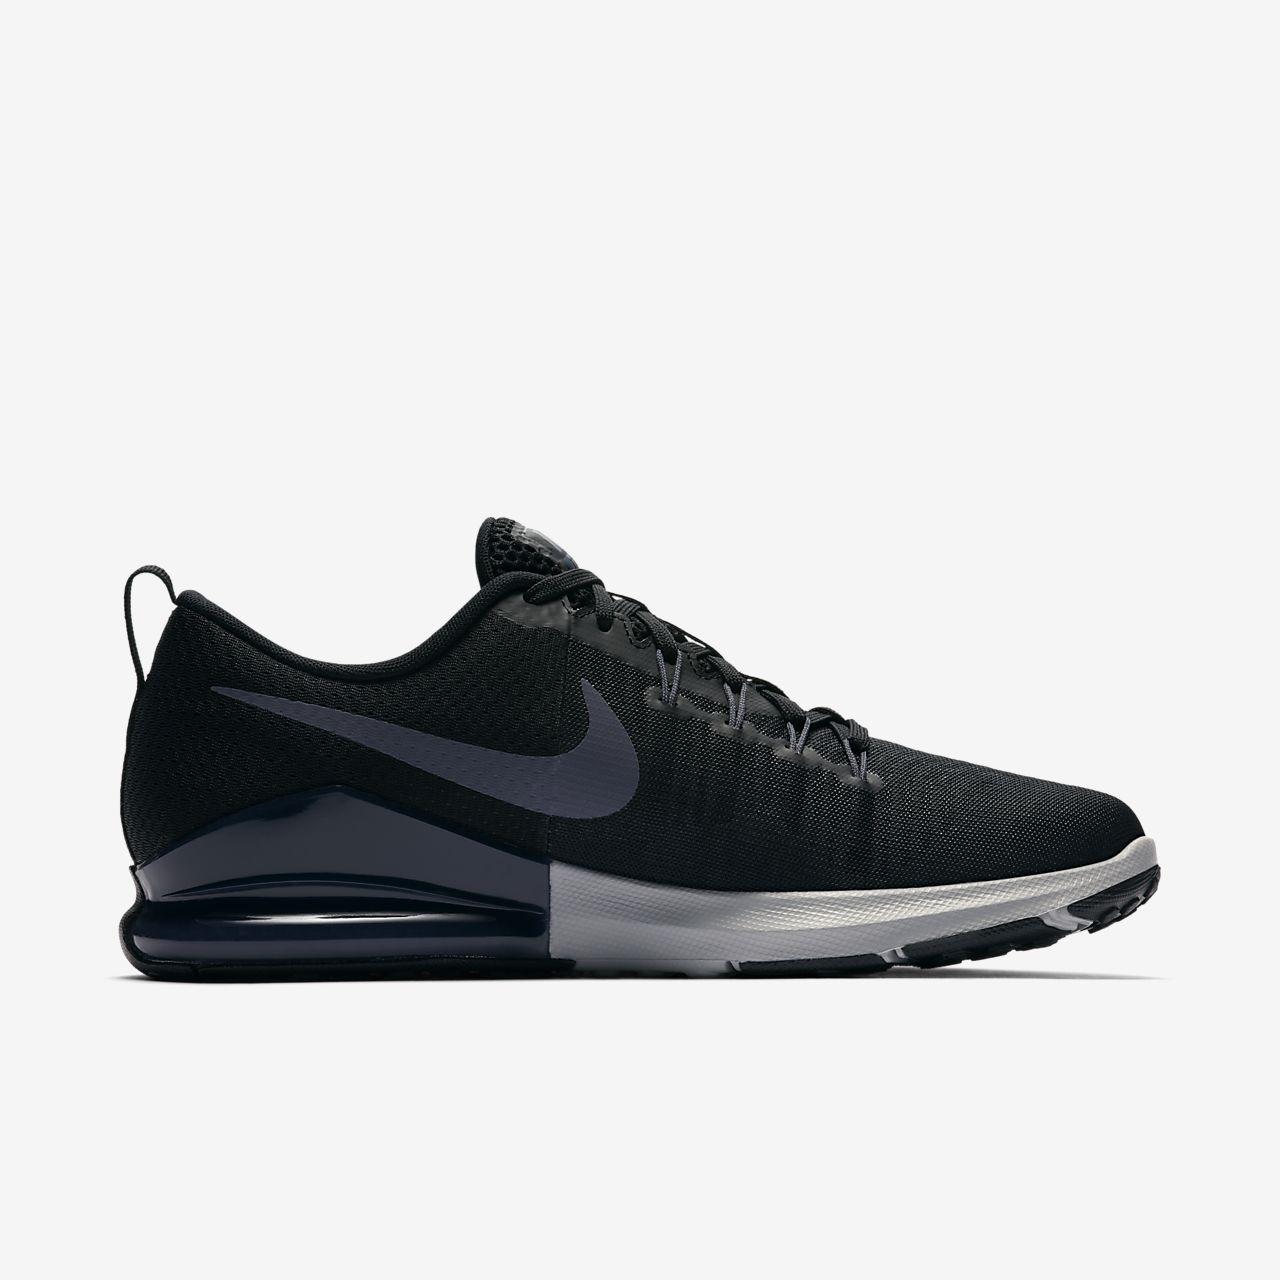 Nike Zoom Train Action Herren-Trainingsschuh Online Get Get Get Best Billig-AR2498DS   ca3d3d